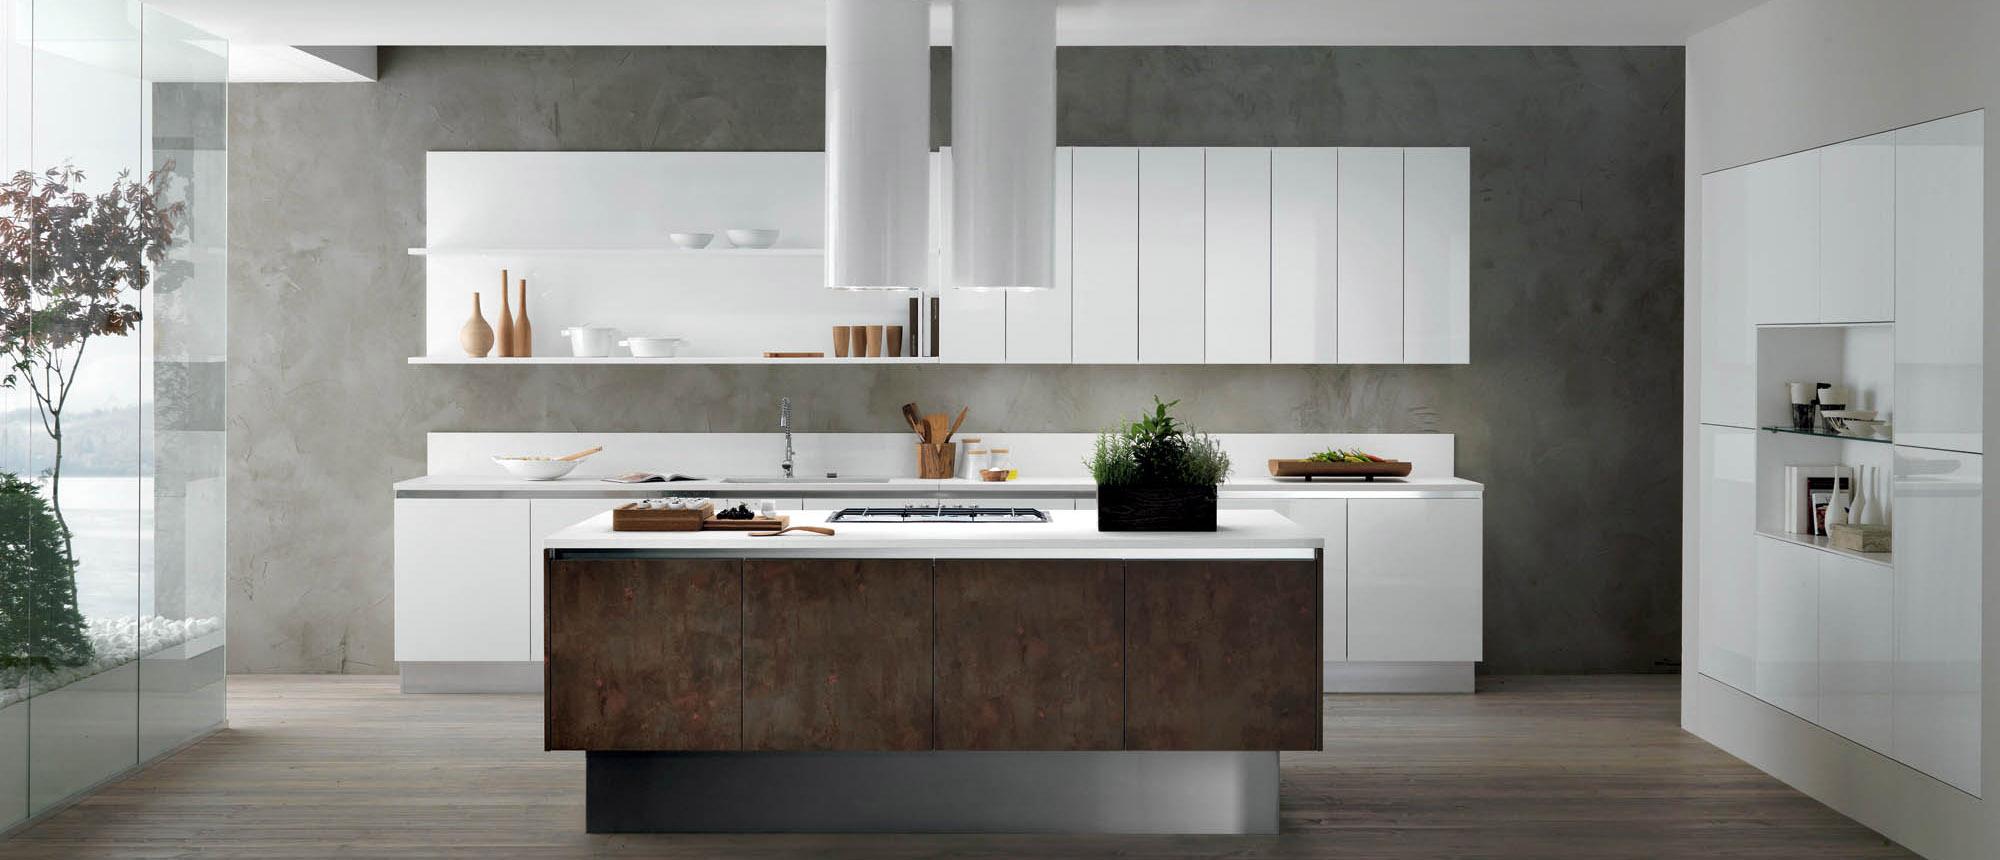 Cucine mobili de pianto - Cucina bianco lucido ...